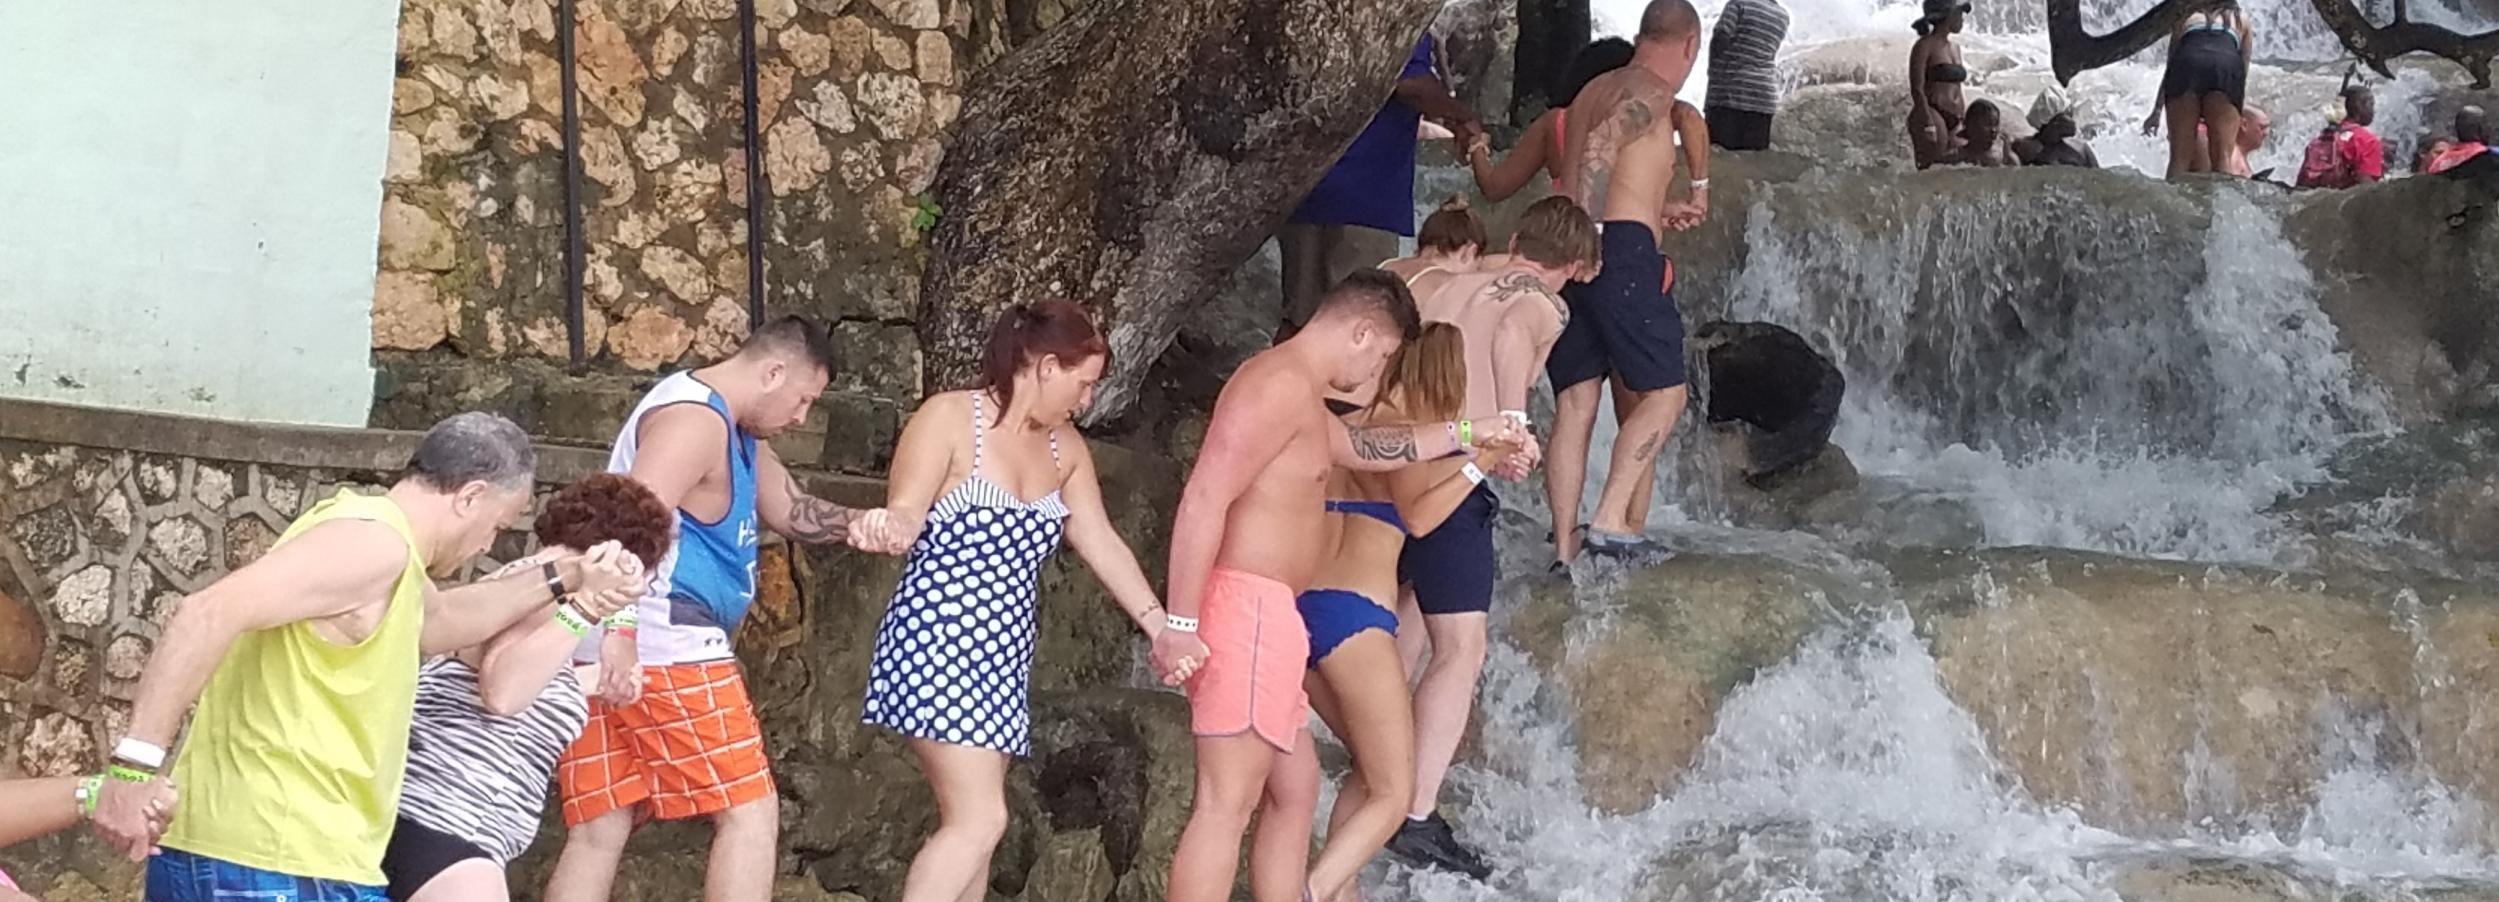 Dunn's River Falls: Tour from Montego Bay, Negril, Ocho Rios